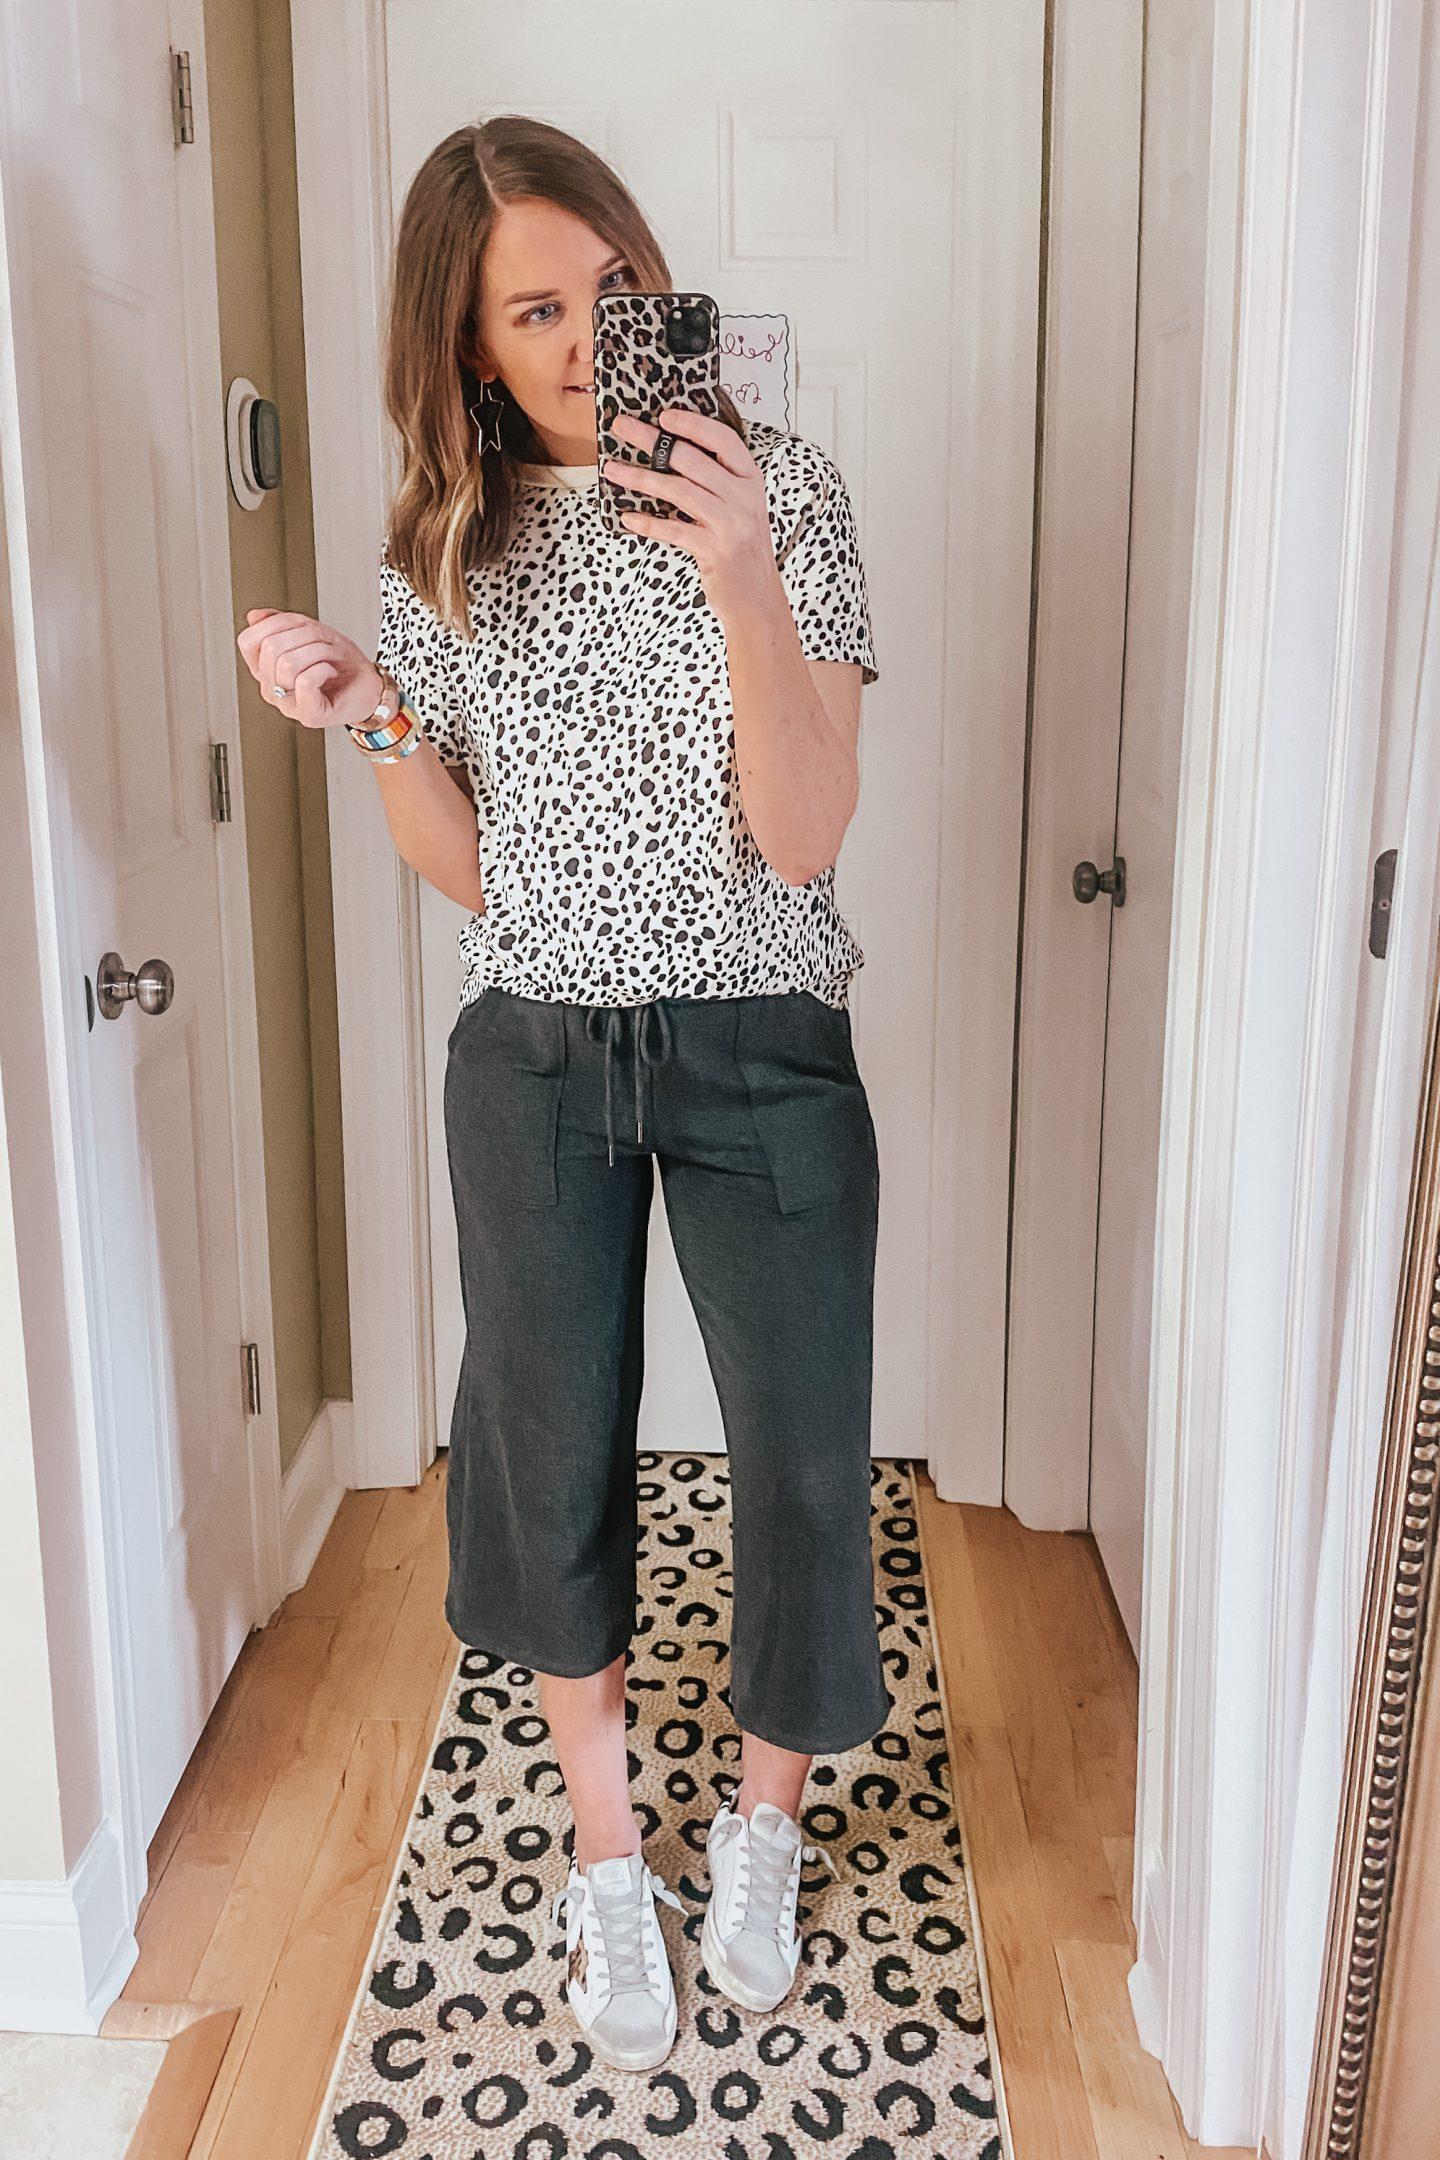 athleisure stile, easy outfit, Amazon fashion, leopard print t-shirt